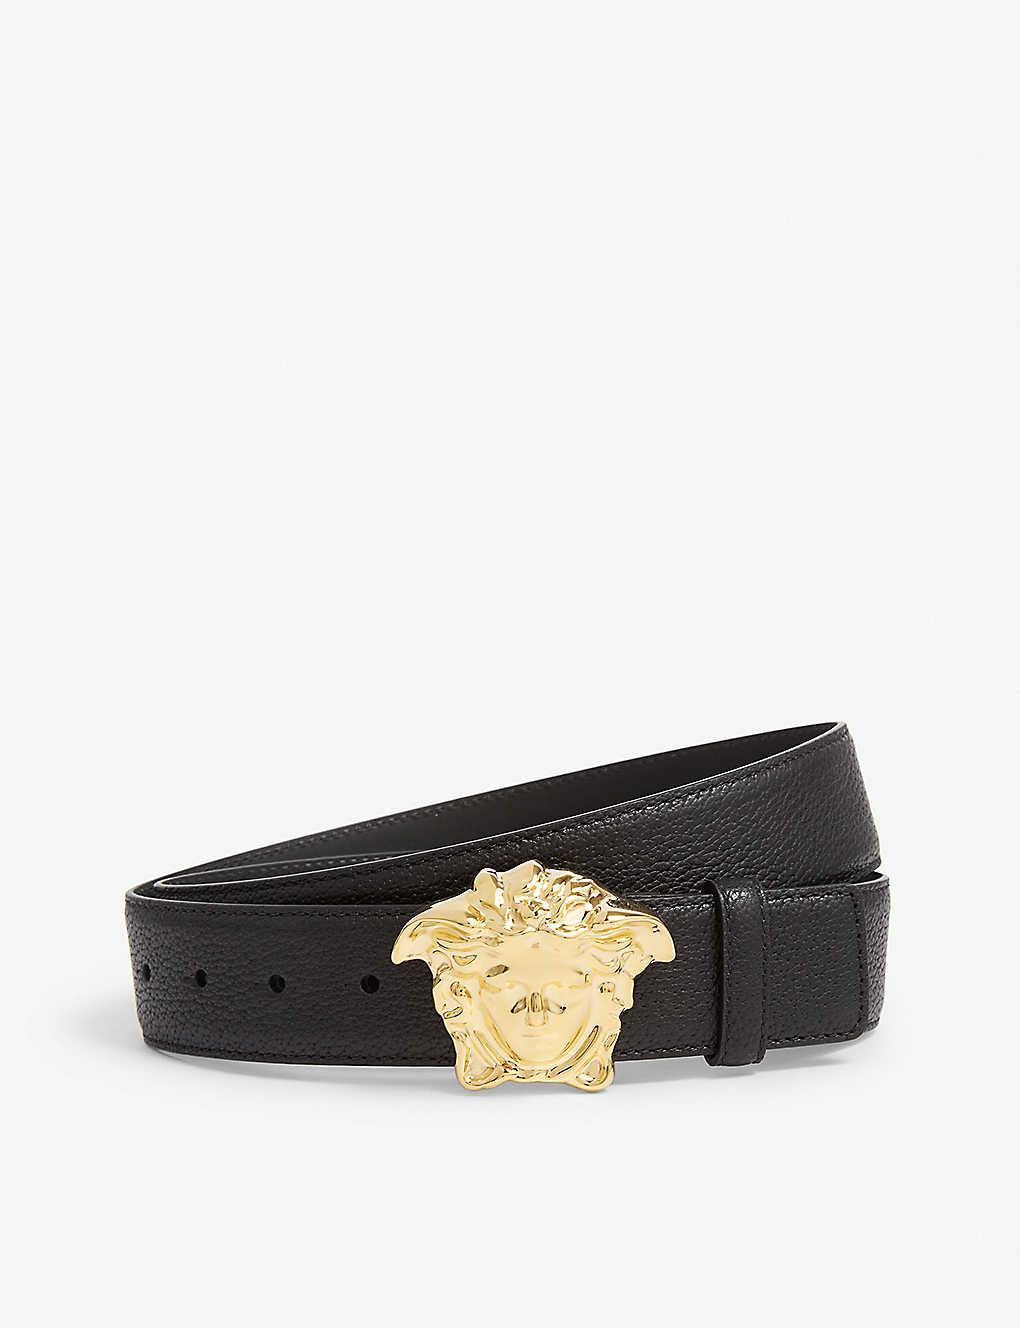 cf29b72c93 VERSACE - Palazzo Medusa leather belt | Selfridges.com